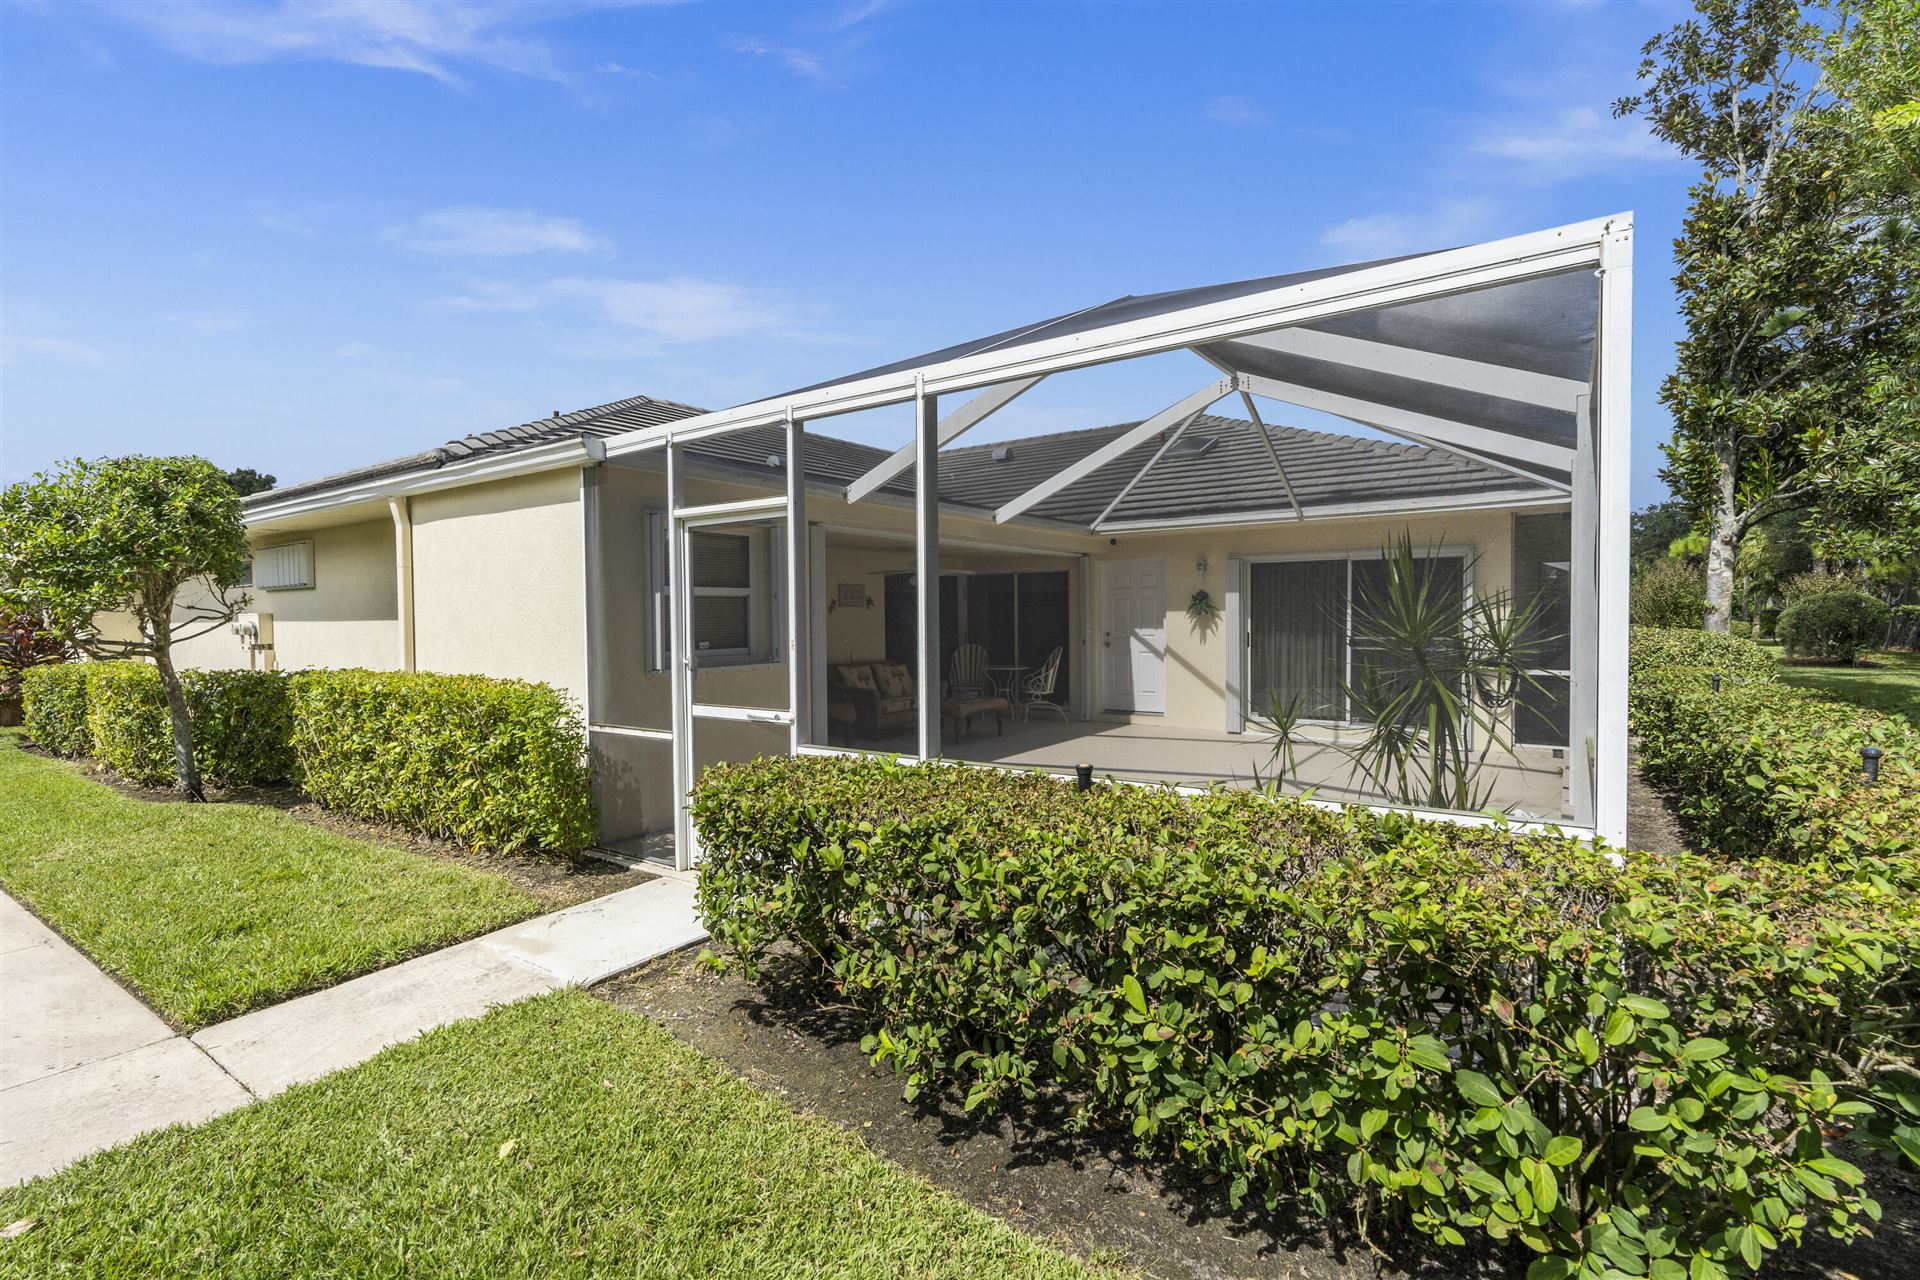 1250 NW Sun Terrace Circle #16 C, Port Saint Lucie, FL 34986 - #: RX-10752248